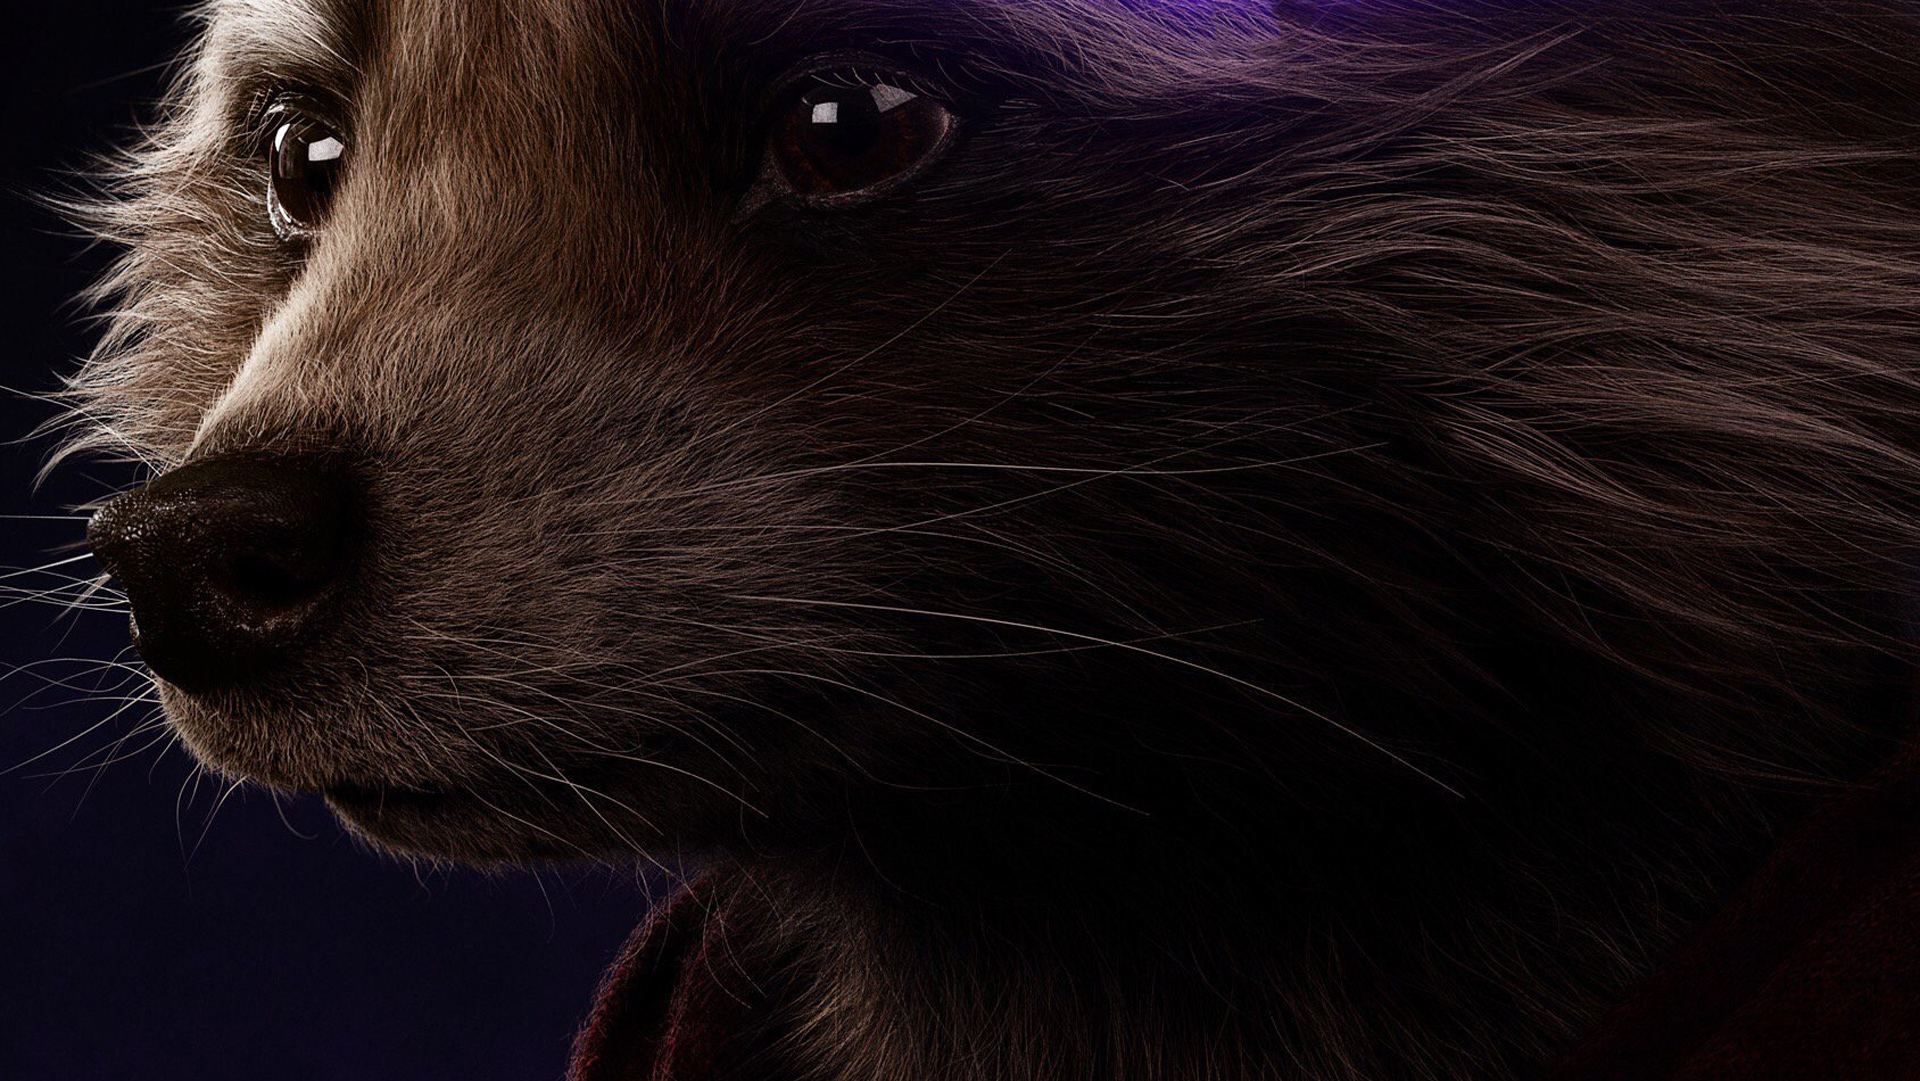 Rocket Raccoon Avengers Endgame 2019 Poster Hd Movies 4k